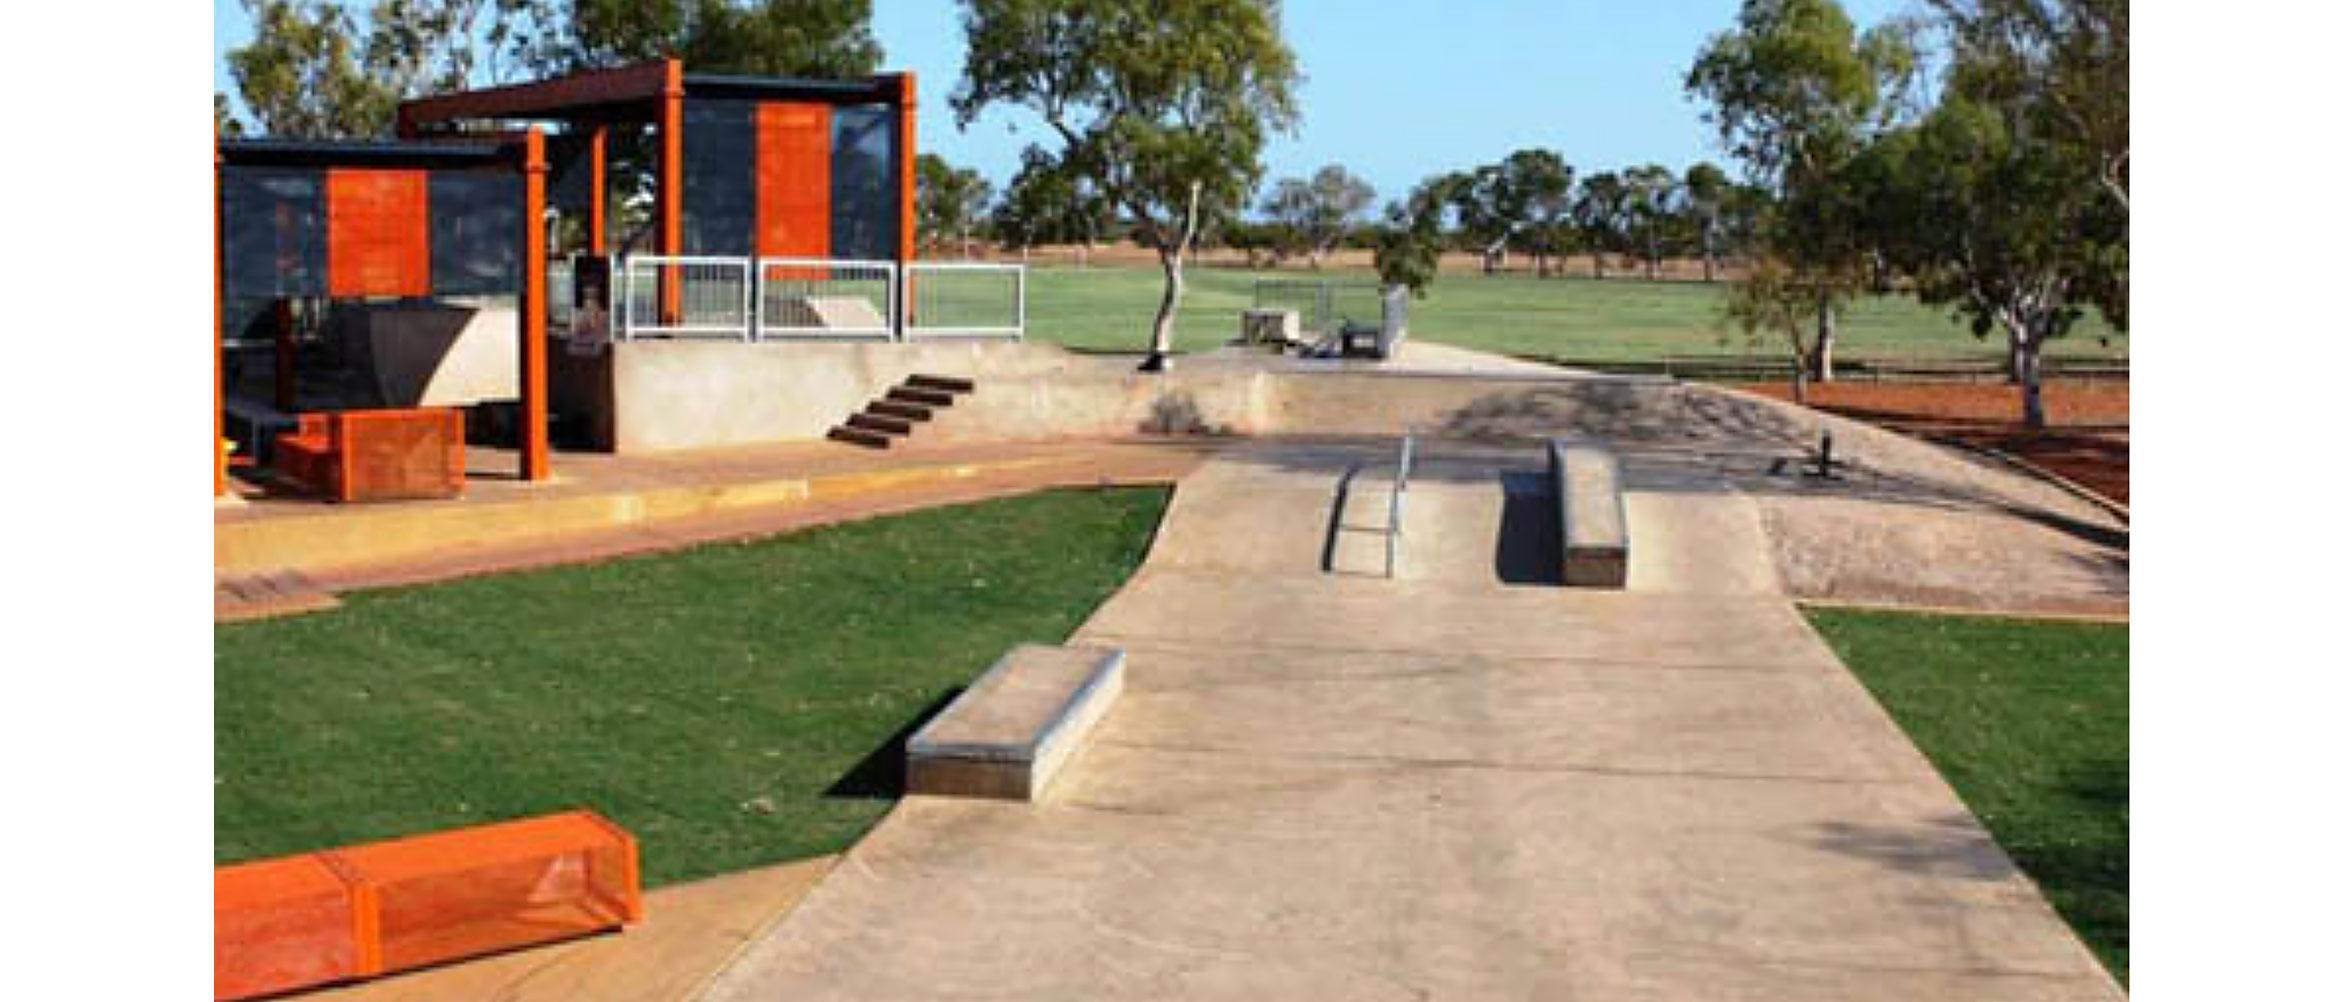 Exmouth skatepark, Western Australia